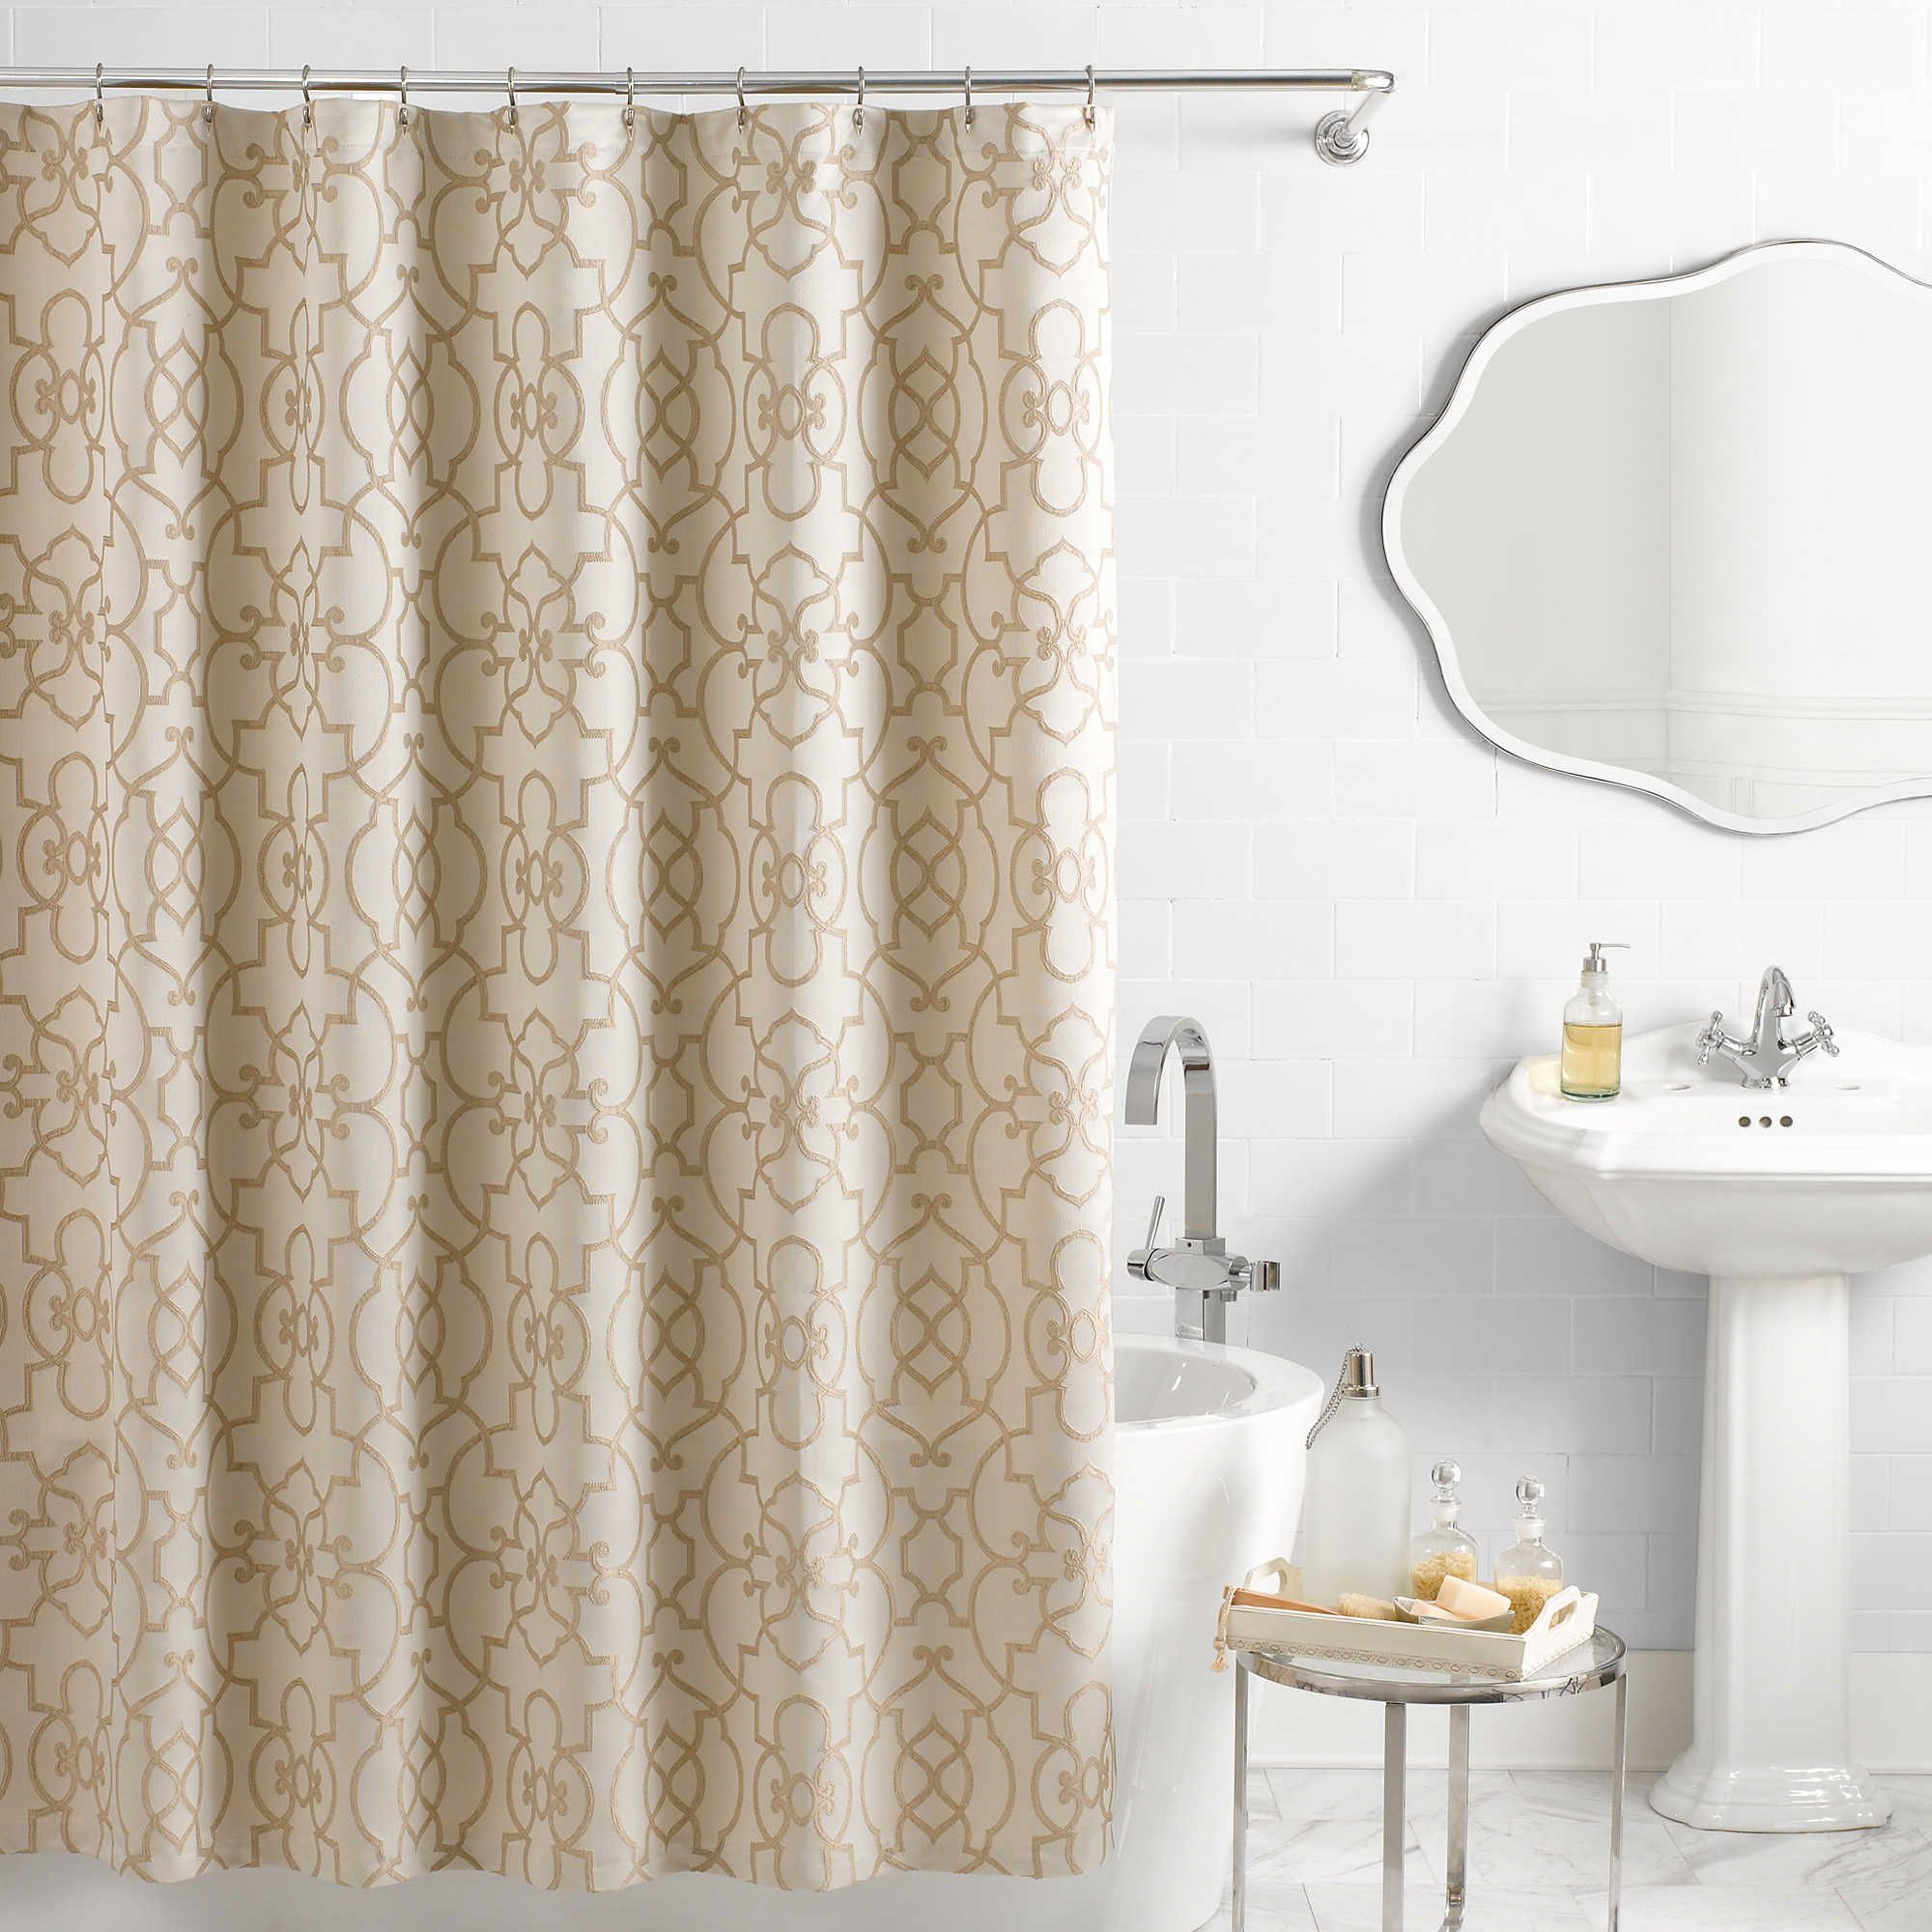 Vue Reg Signature Iron Gates Jacquard Shower Curtain In Ivory Tan